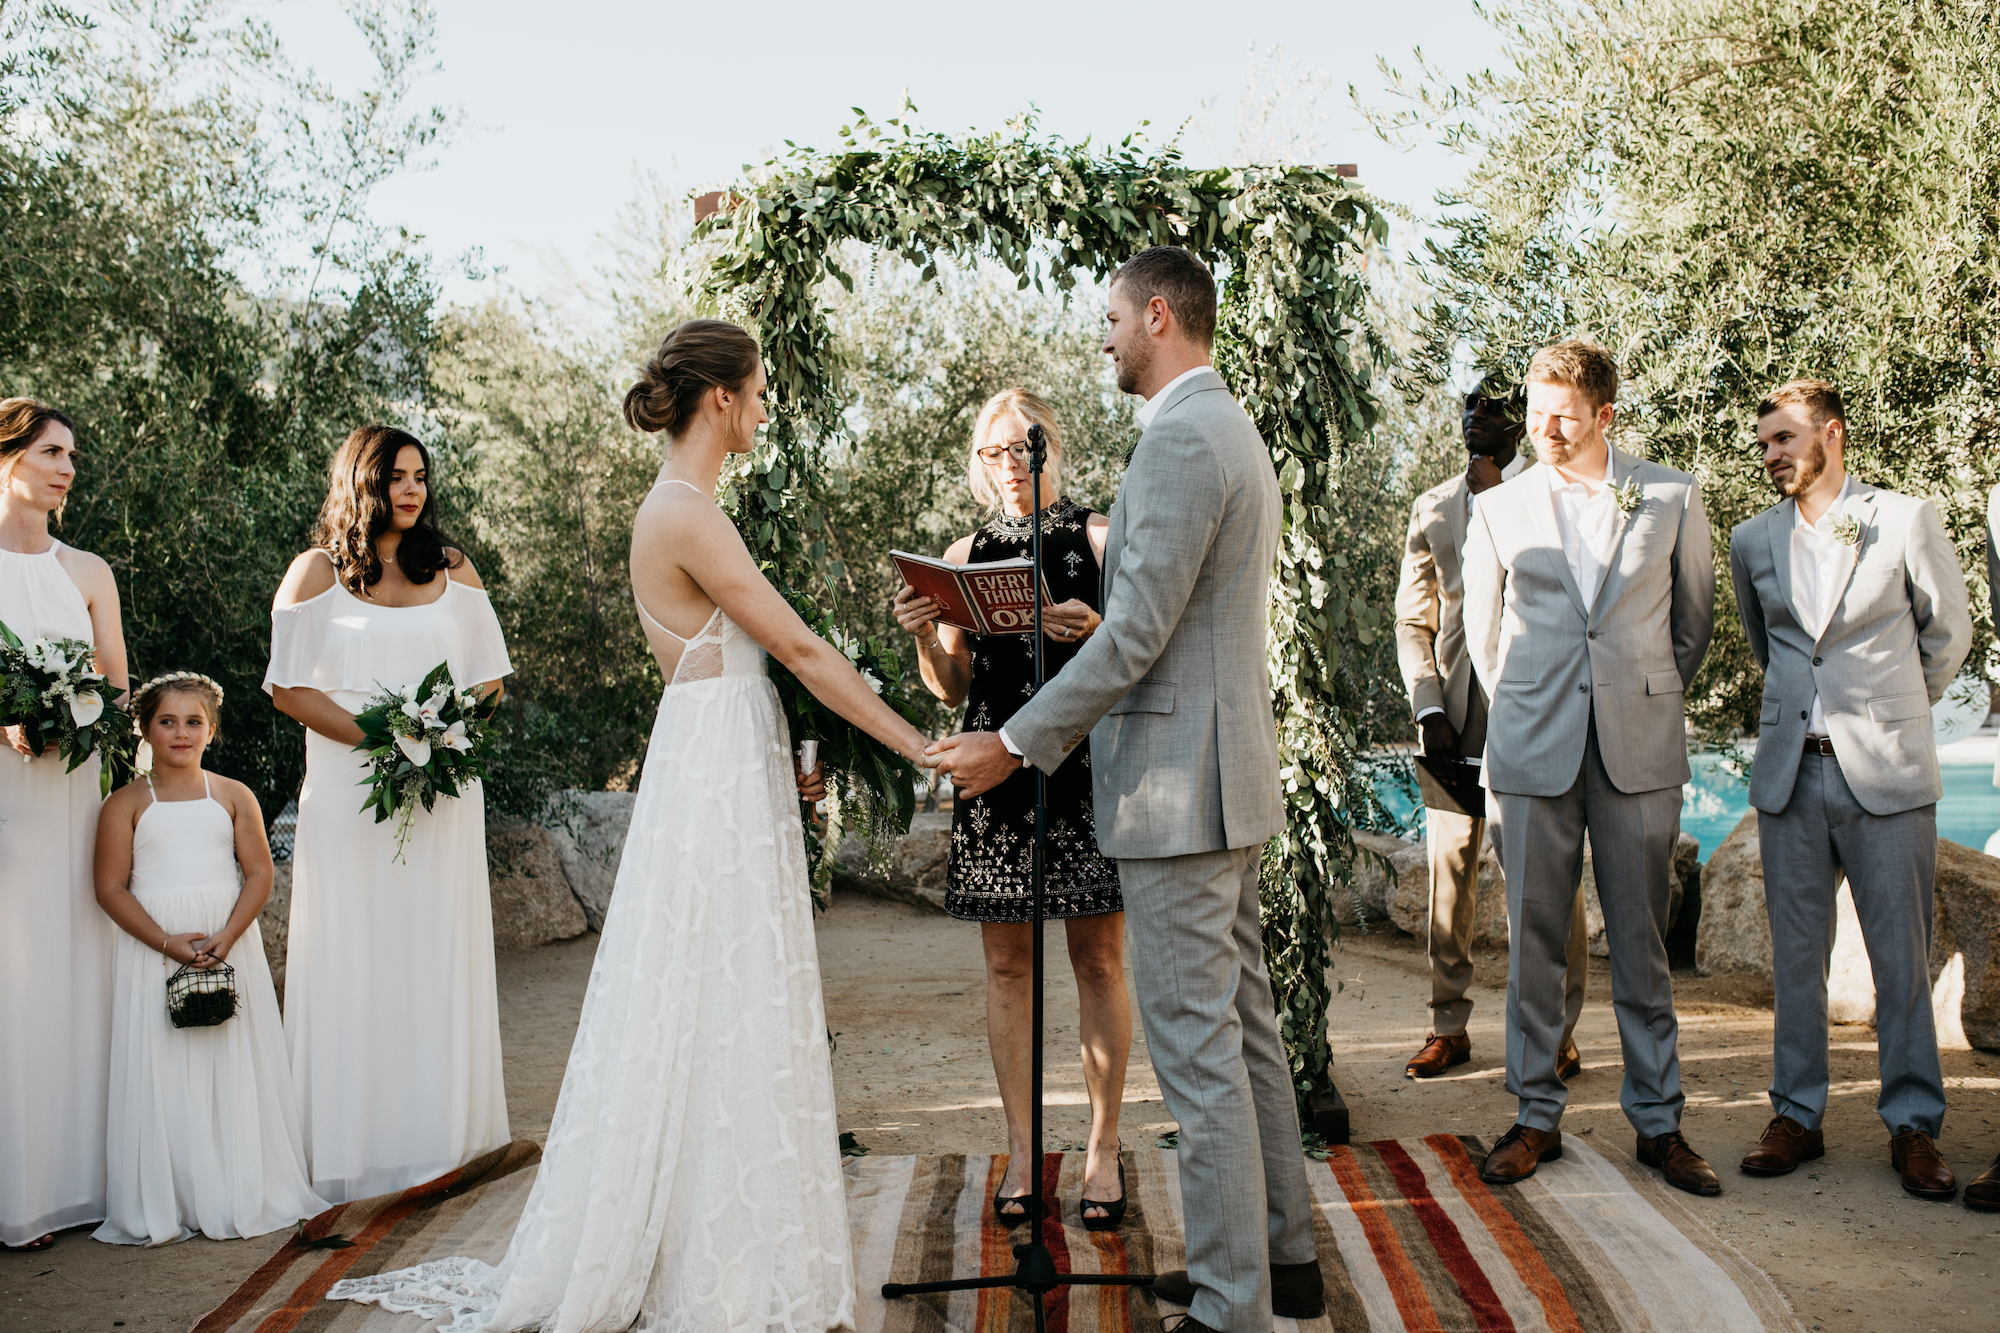 ace-hotel-palm-springs-wedding-photographer547.jpg